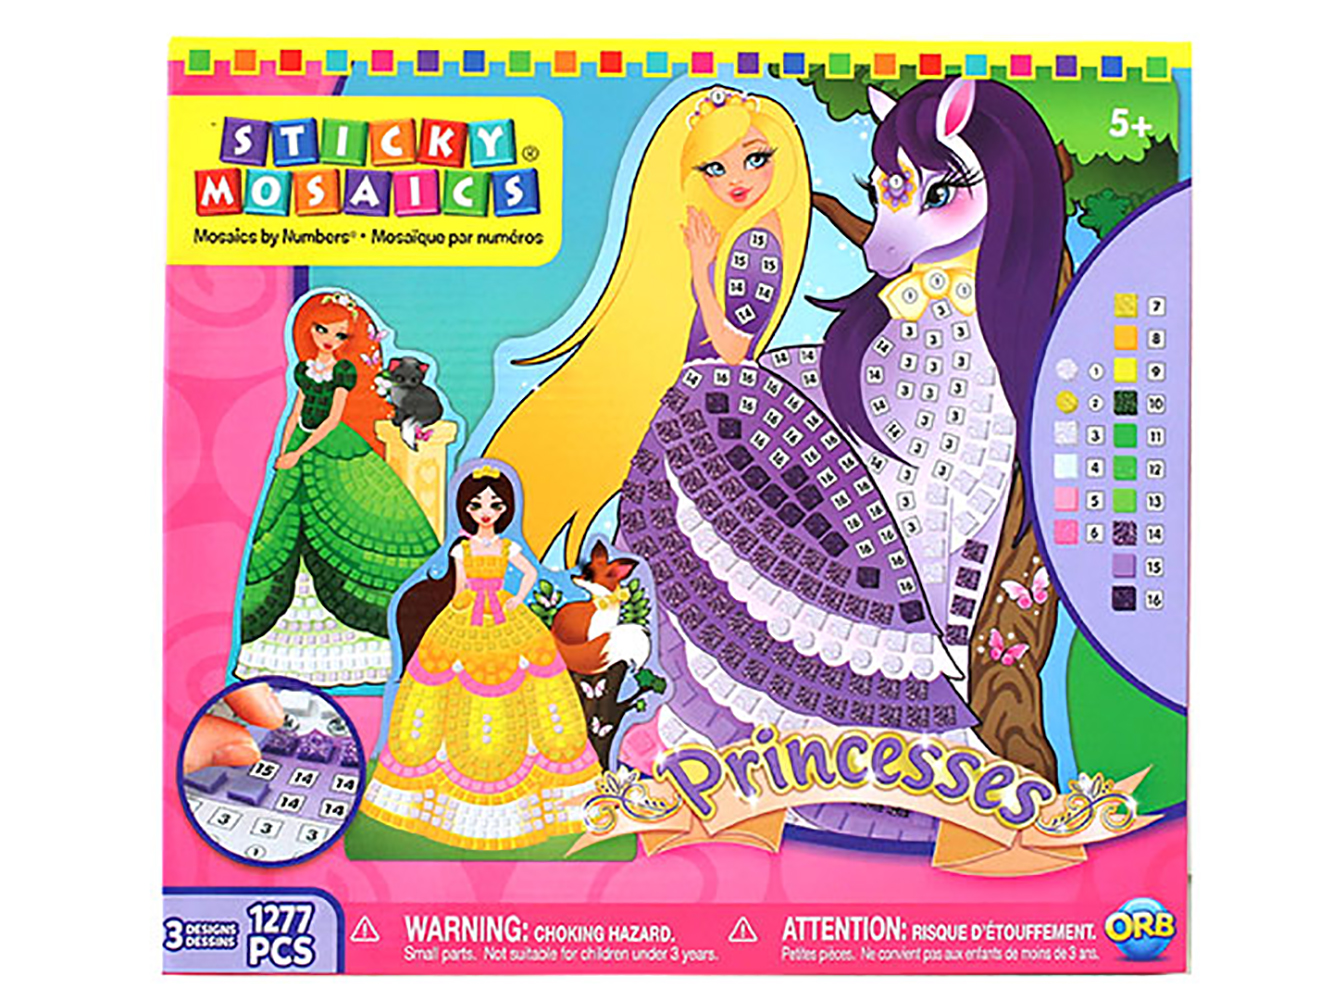 Sticky Mosaics - Princesses